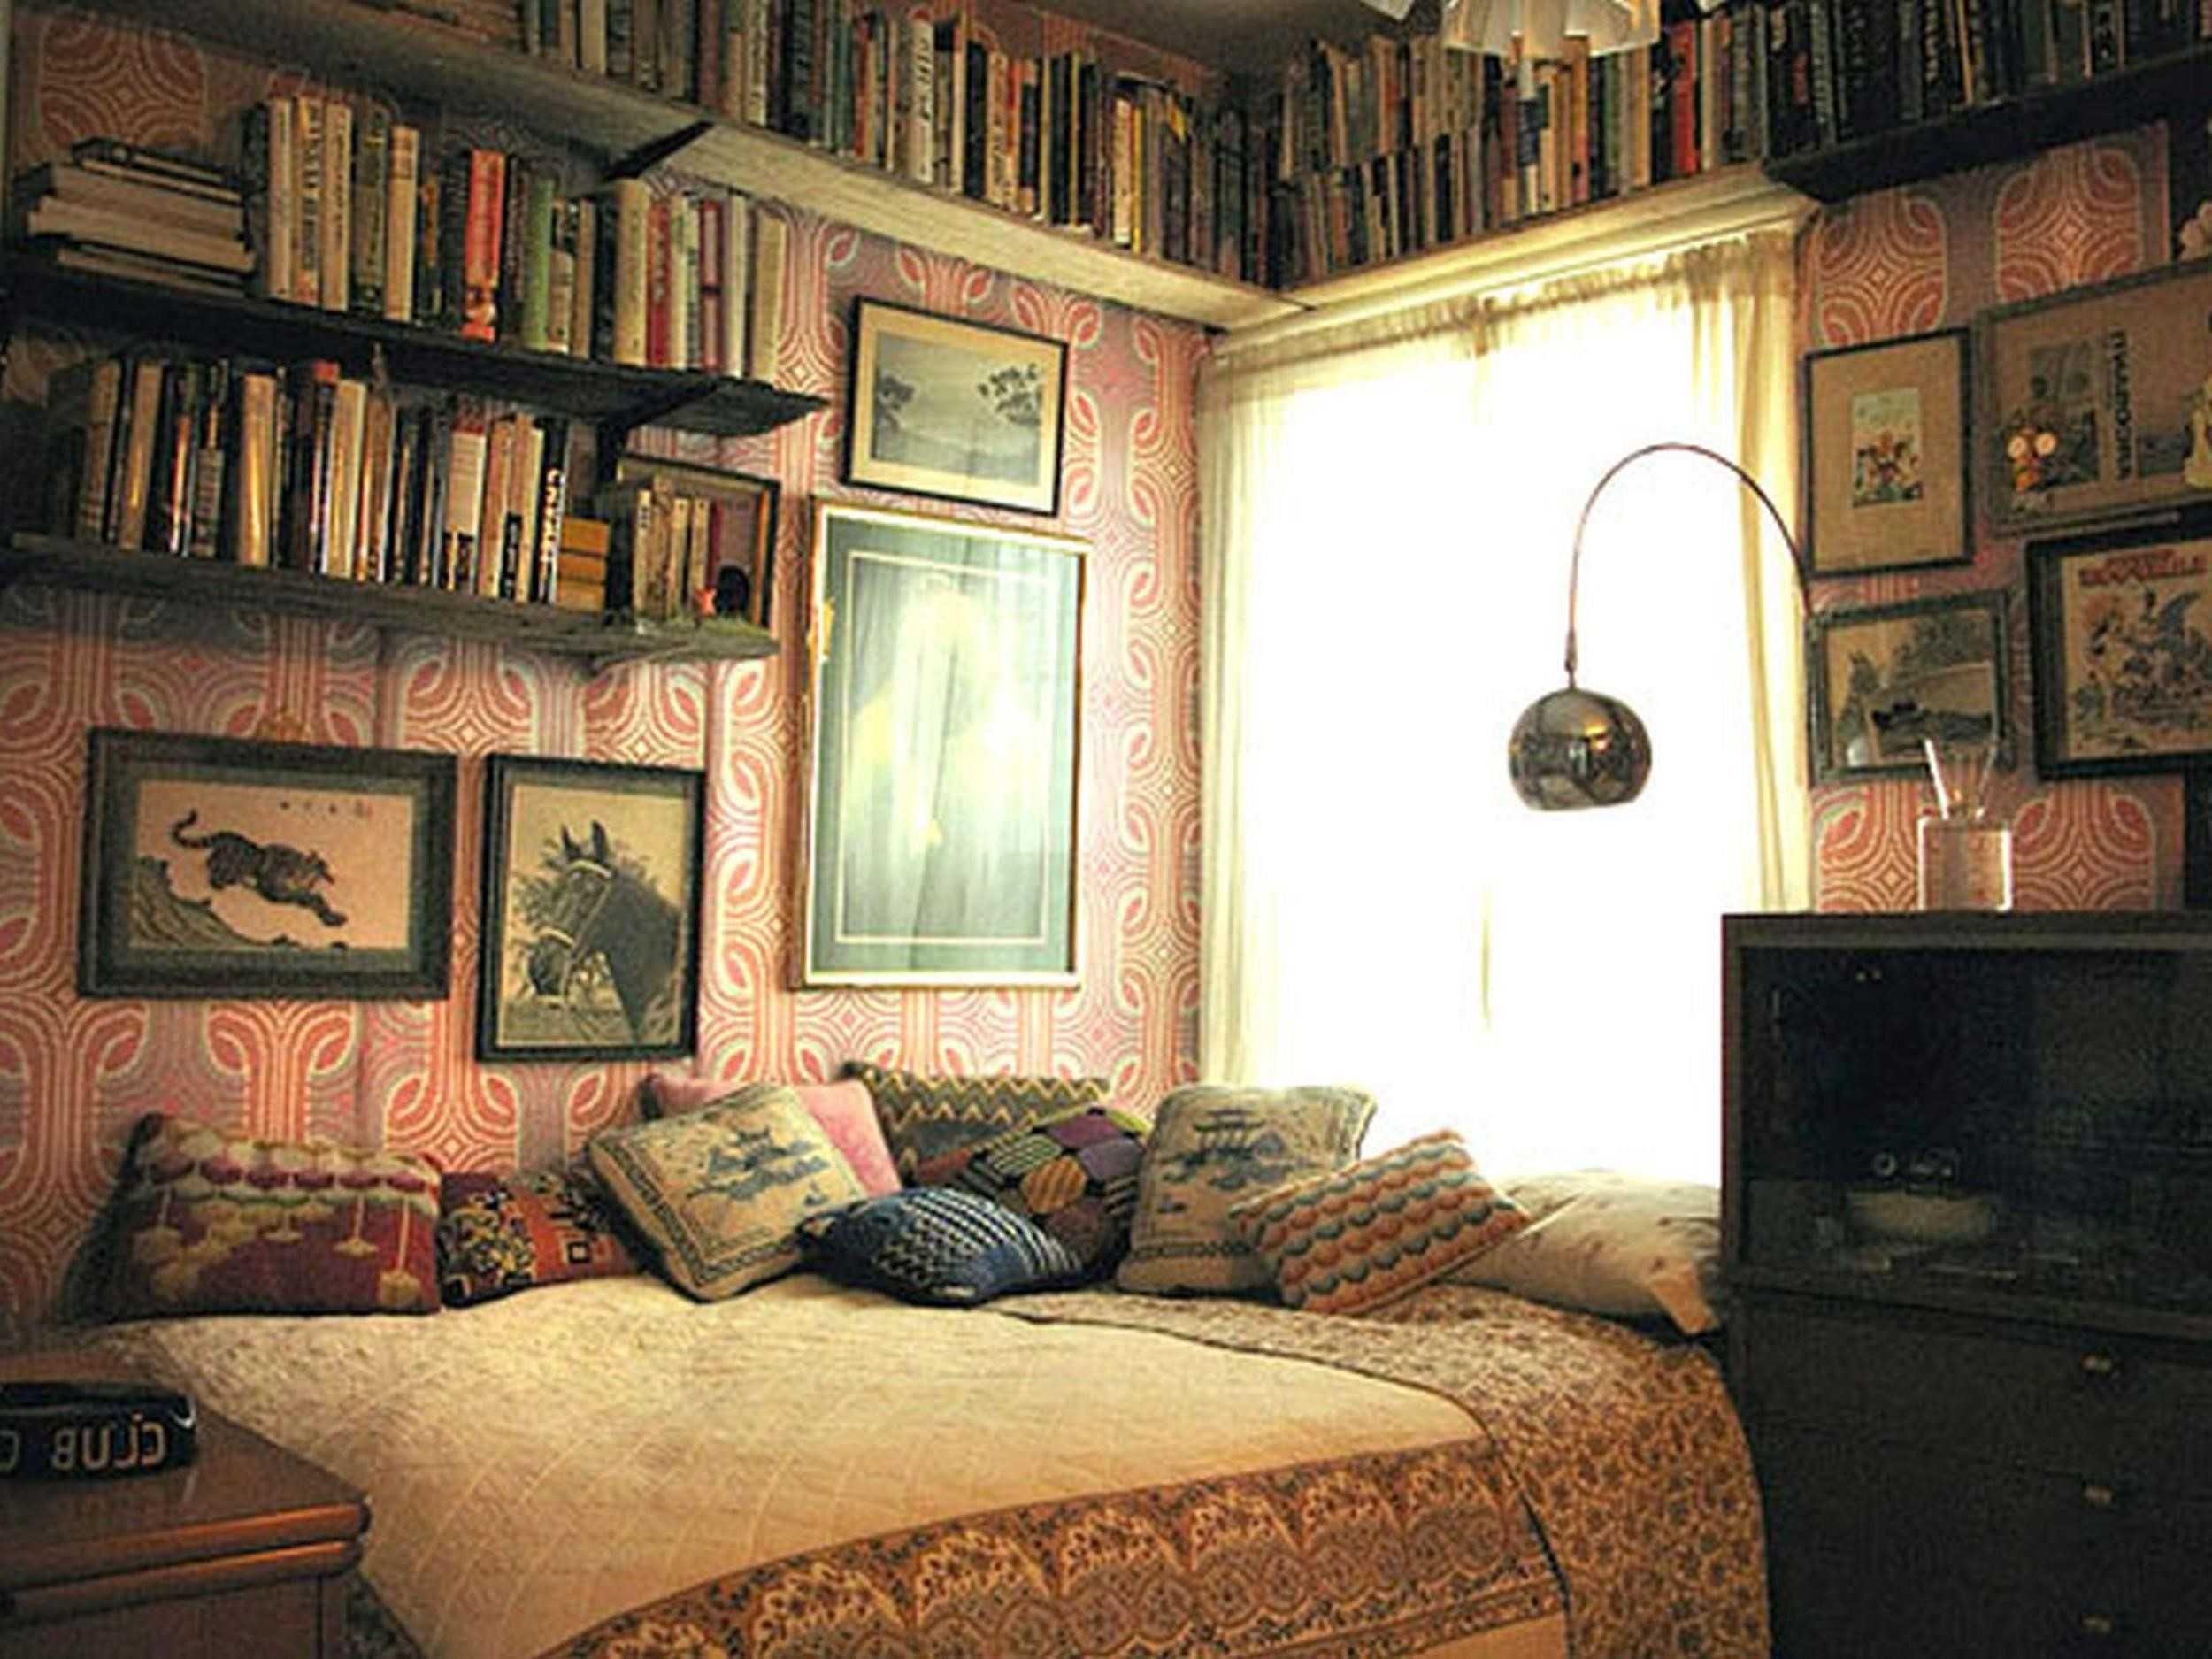 Teenage Bedroom Designs Tumblr Bedroom Decor Design Indie Bedroom Bedroom Vintage